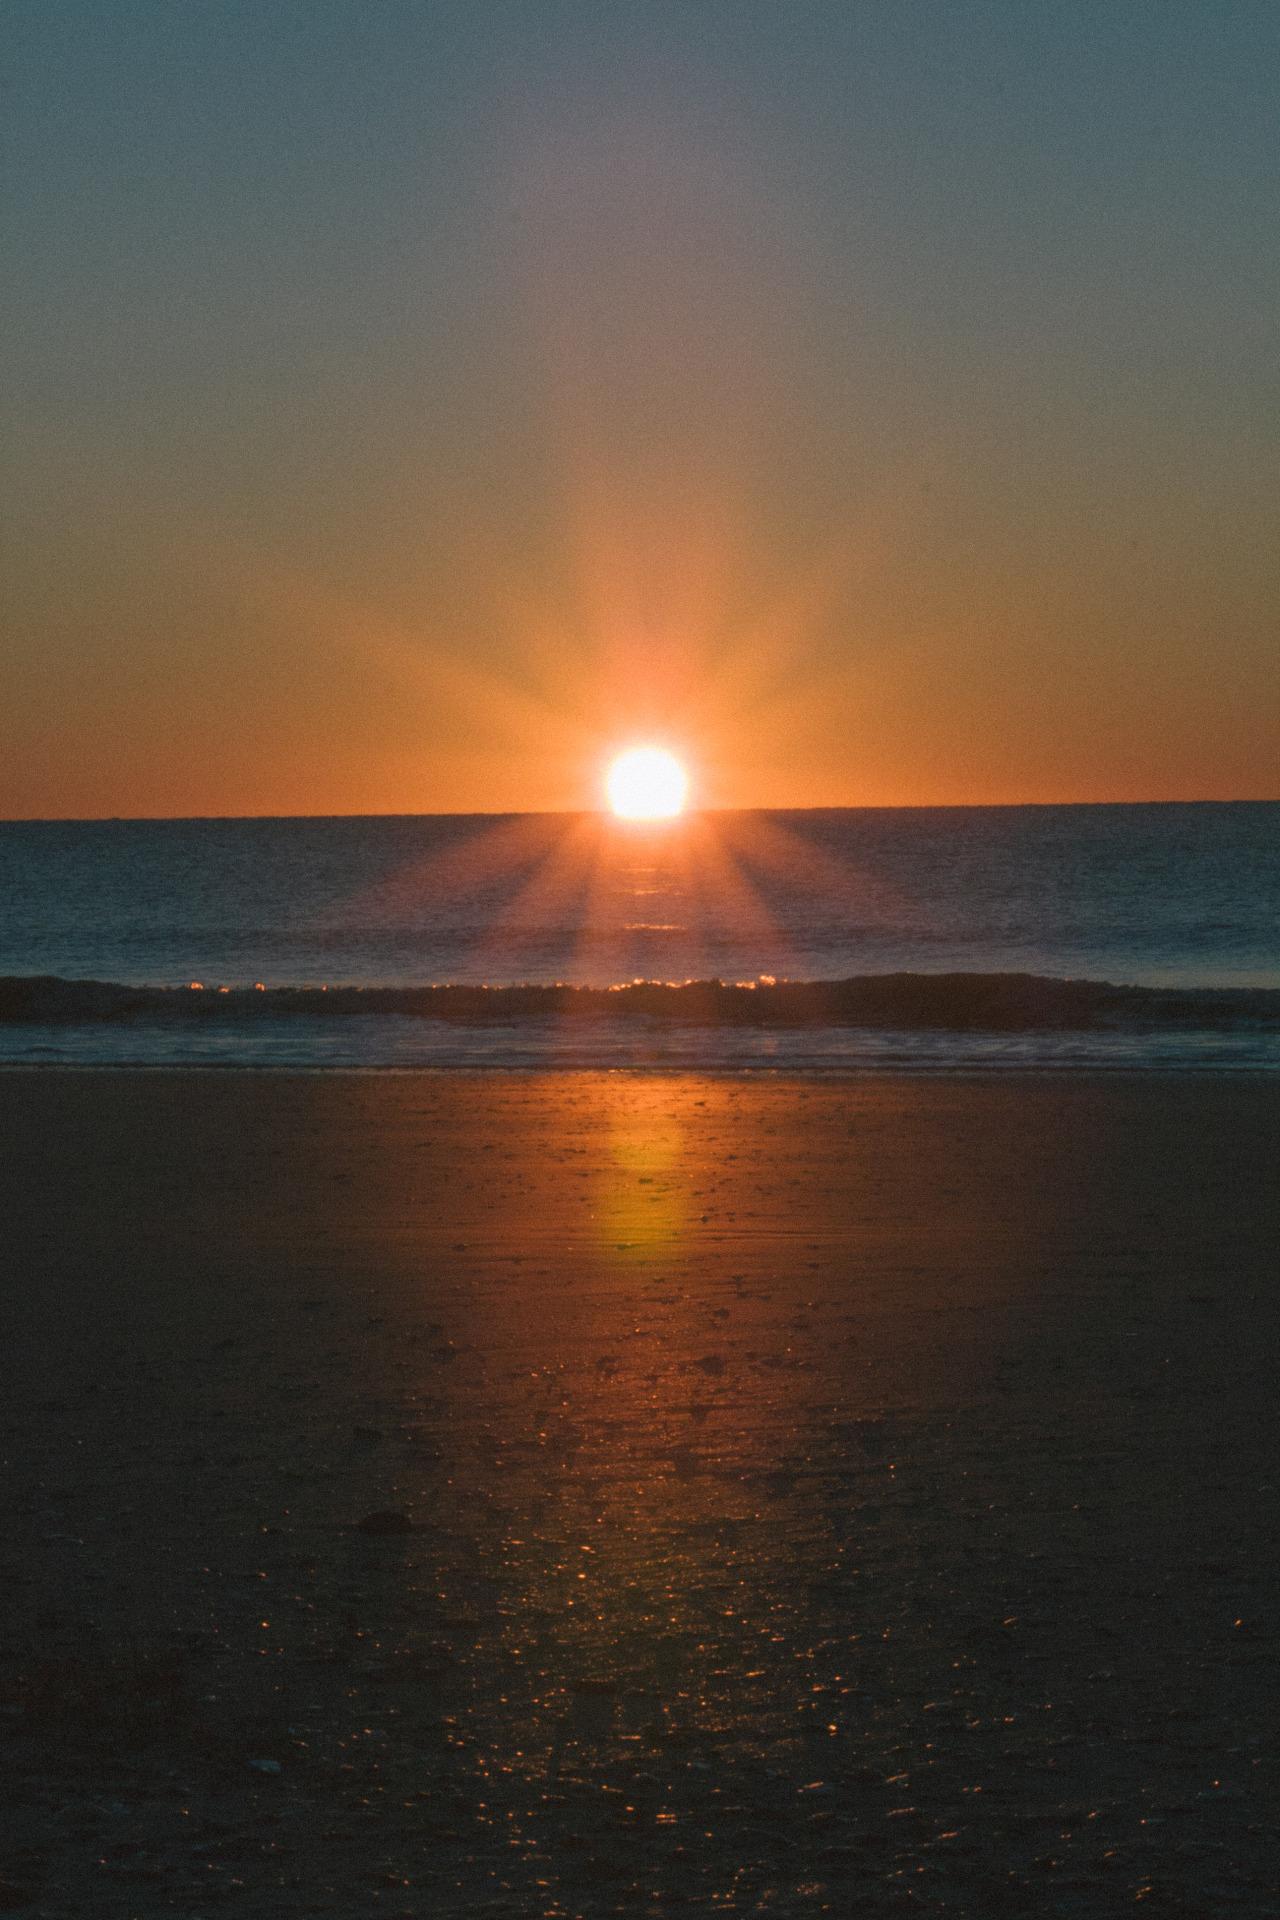 Sunburst with a dash of grain